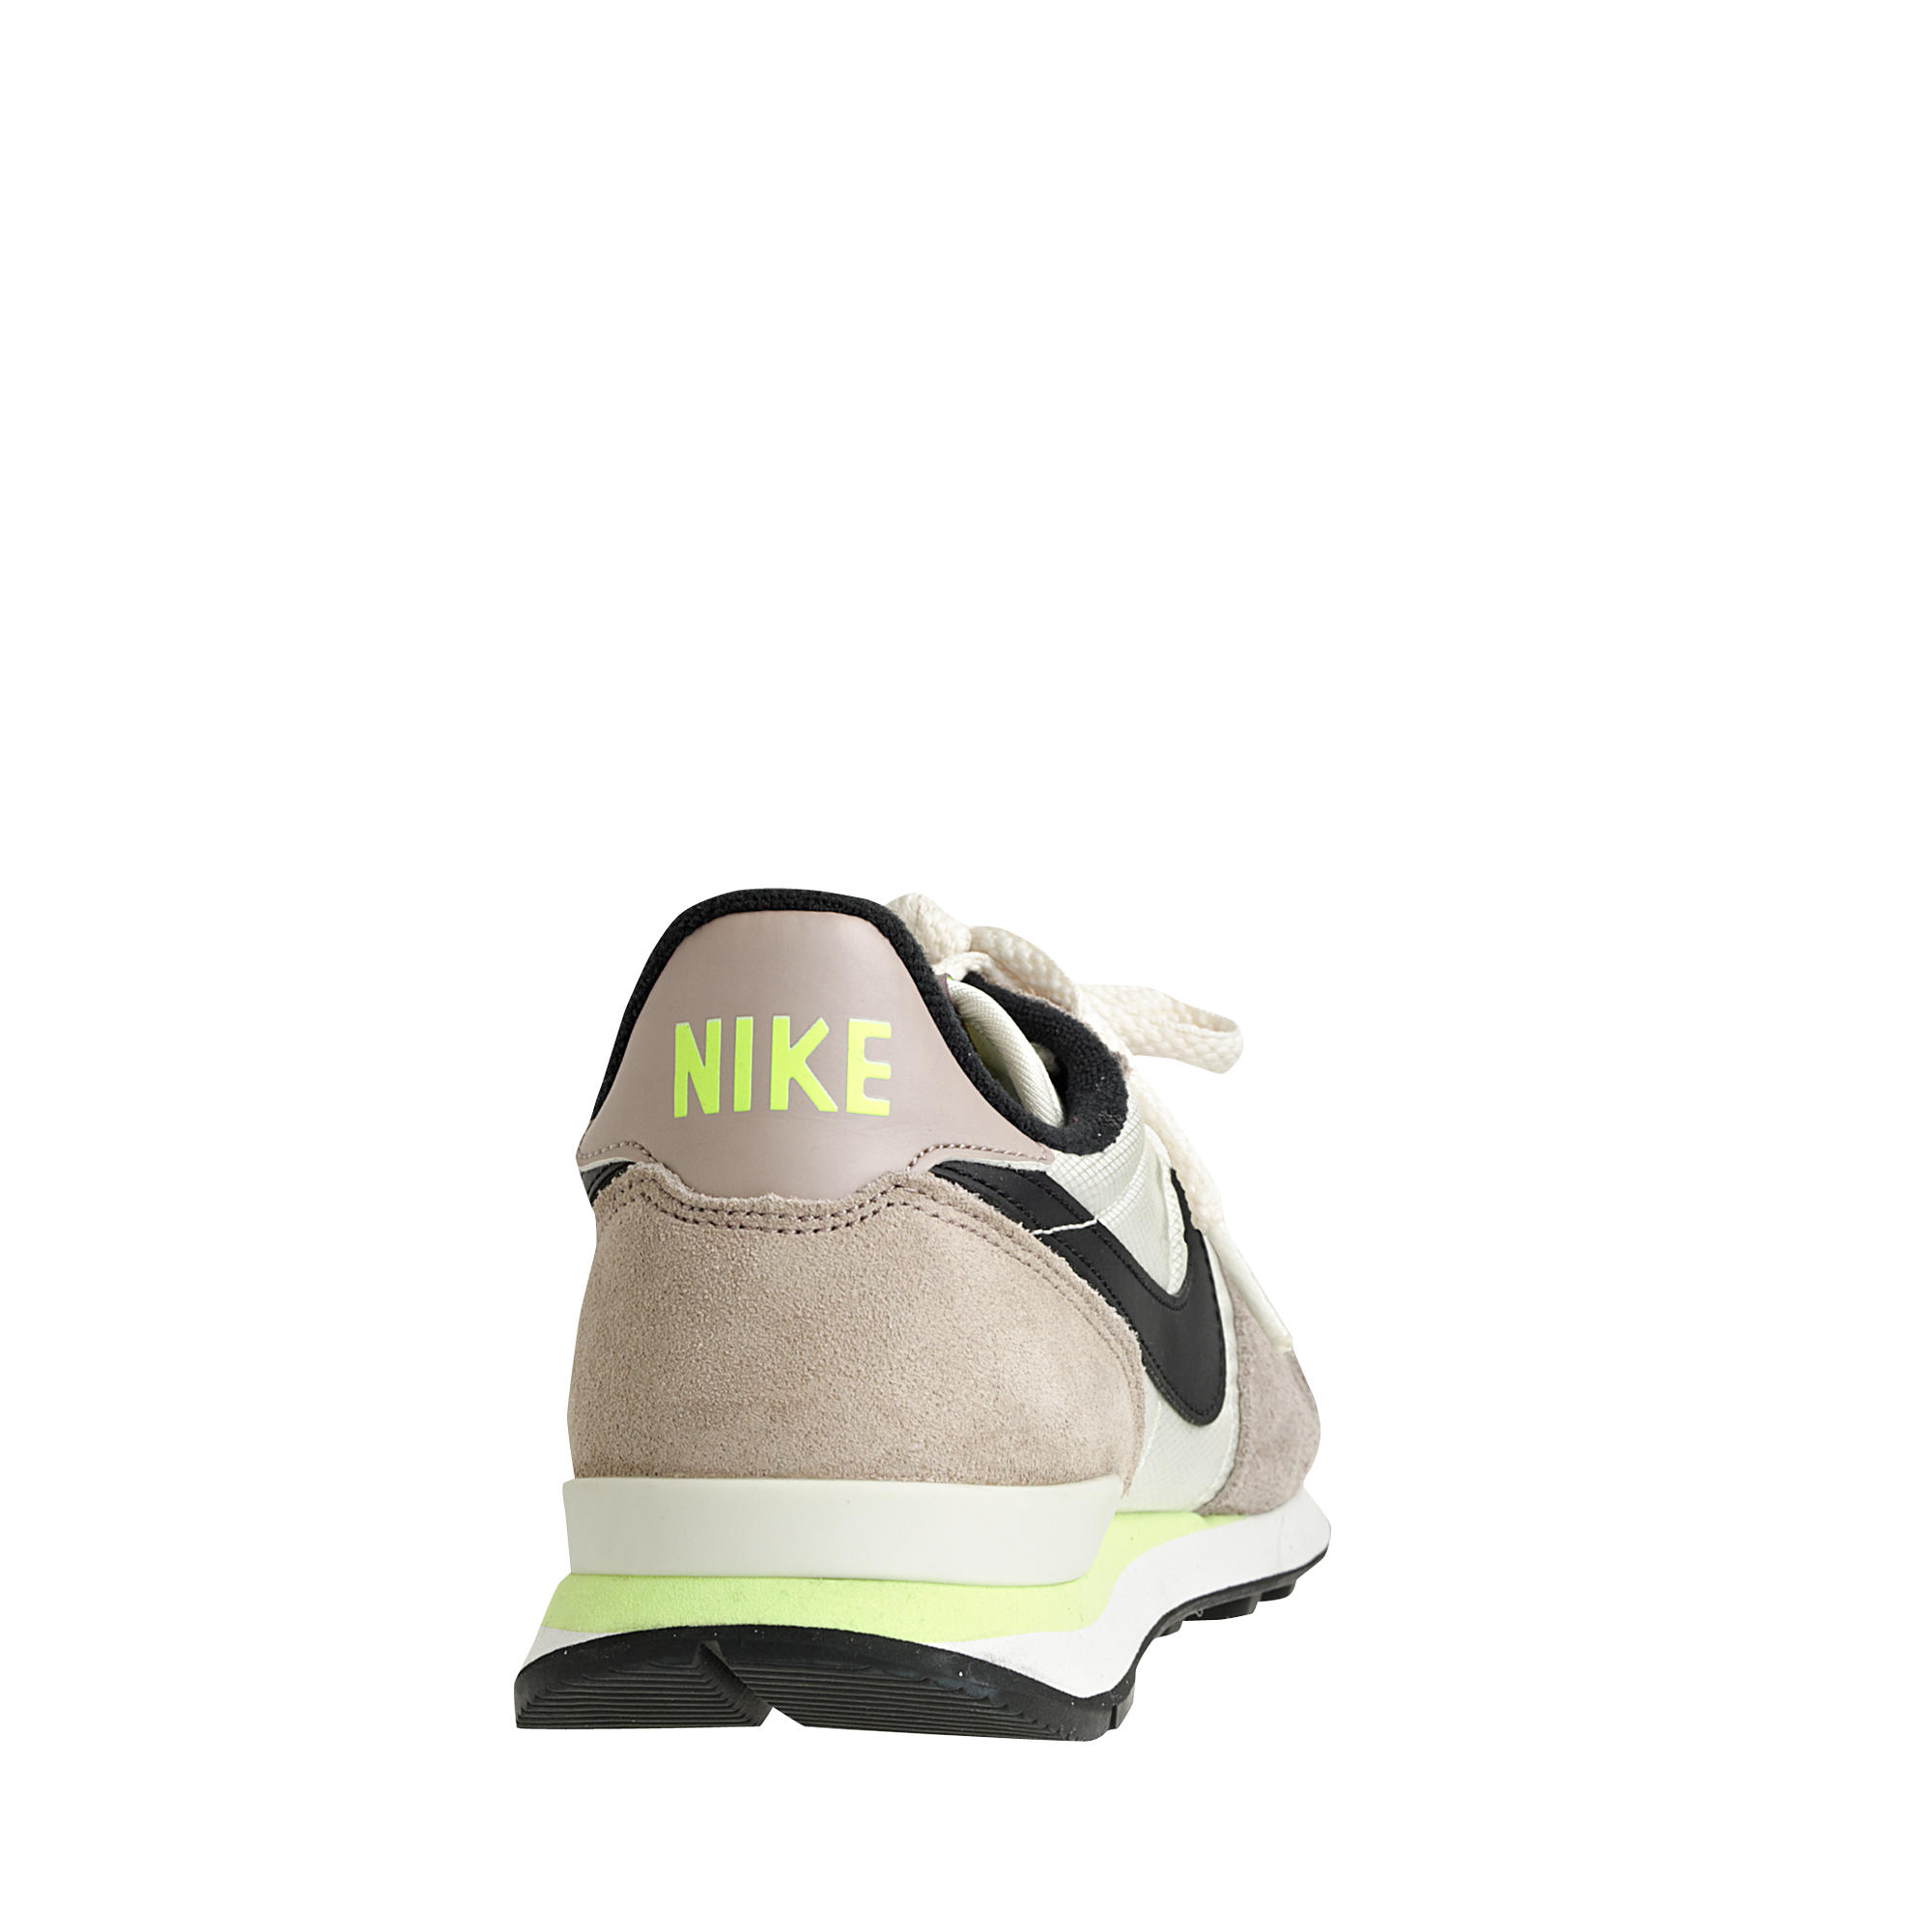 online store 917a1 b2df3 J.Crew Women s Nike Internationalist Sneakers in Brown - Lyst